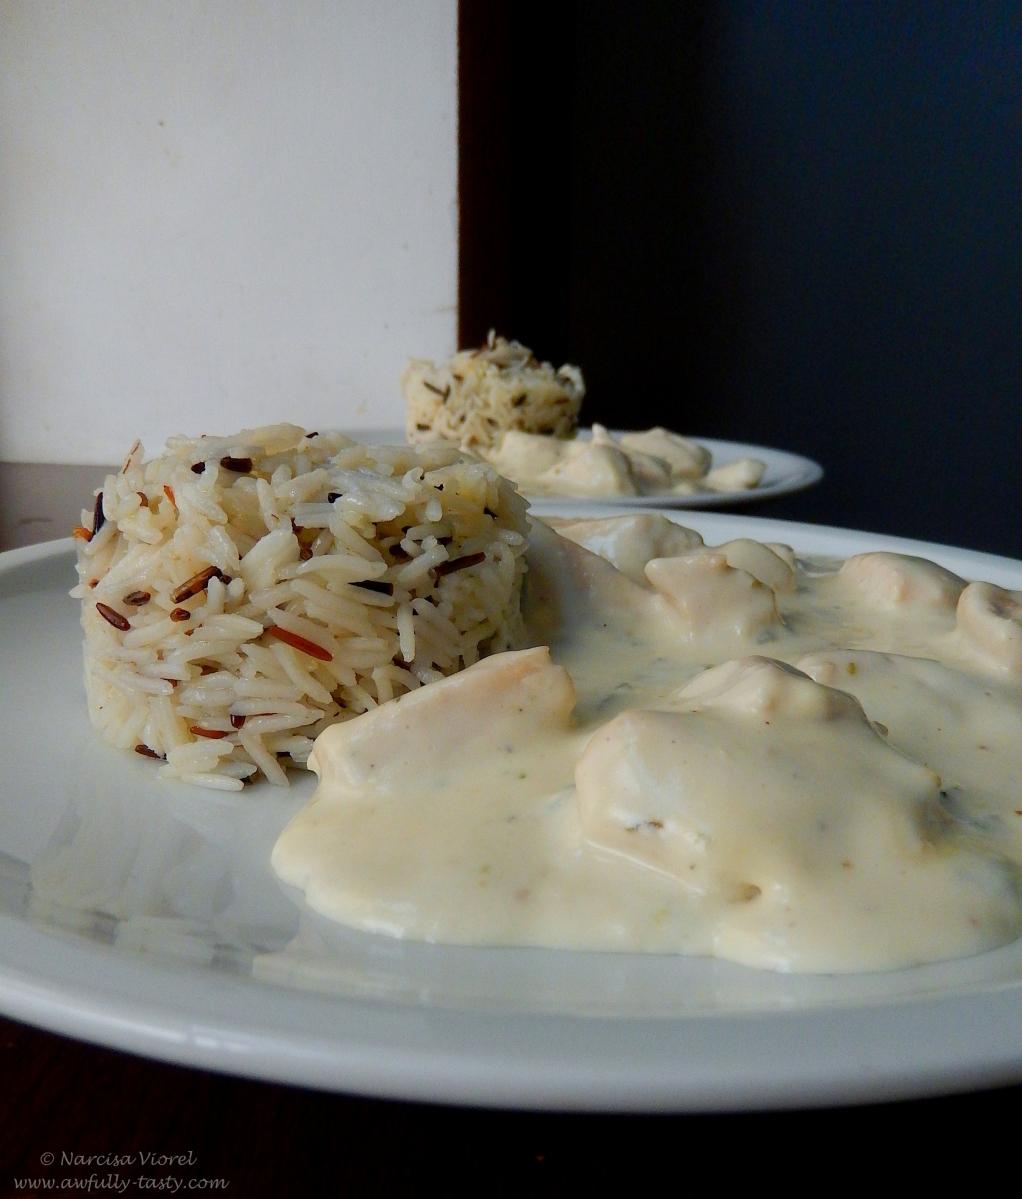 Piept de pui cu gorgonzola